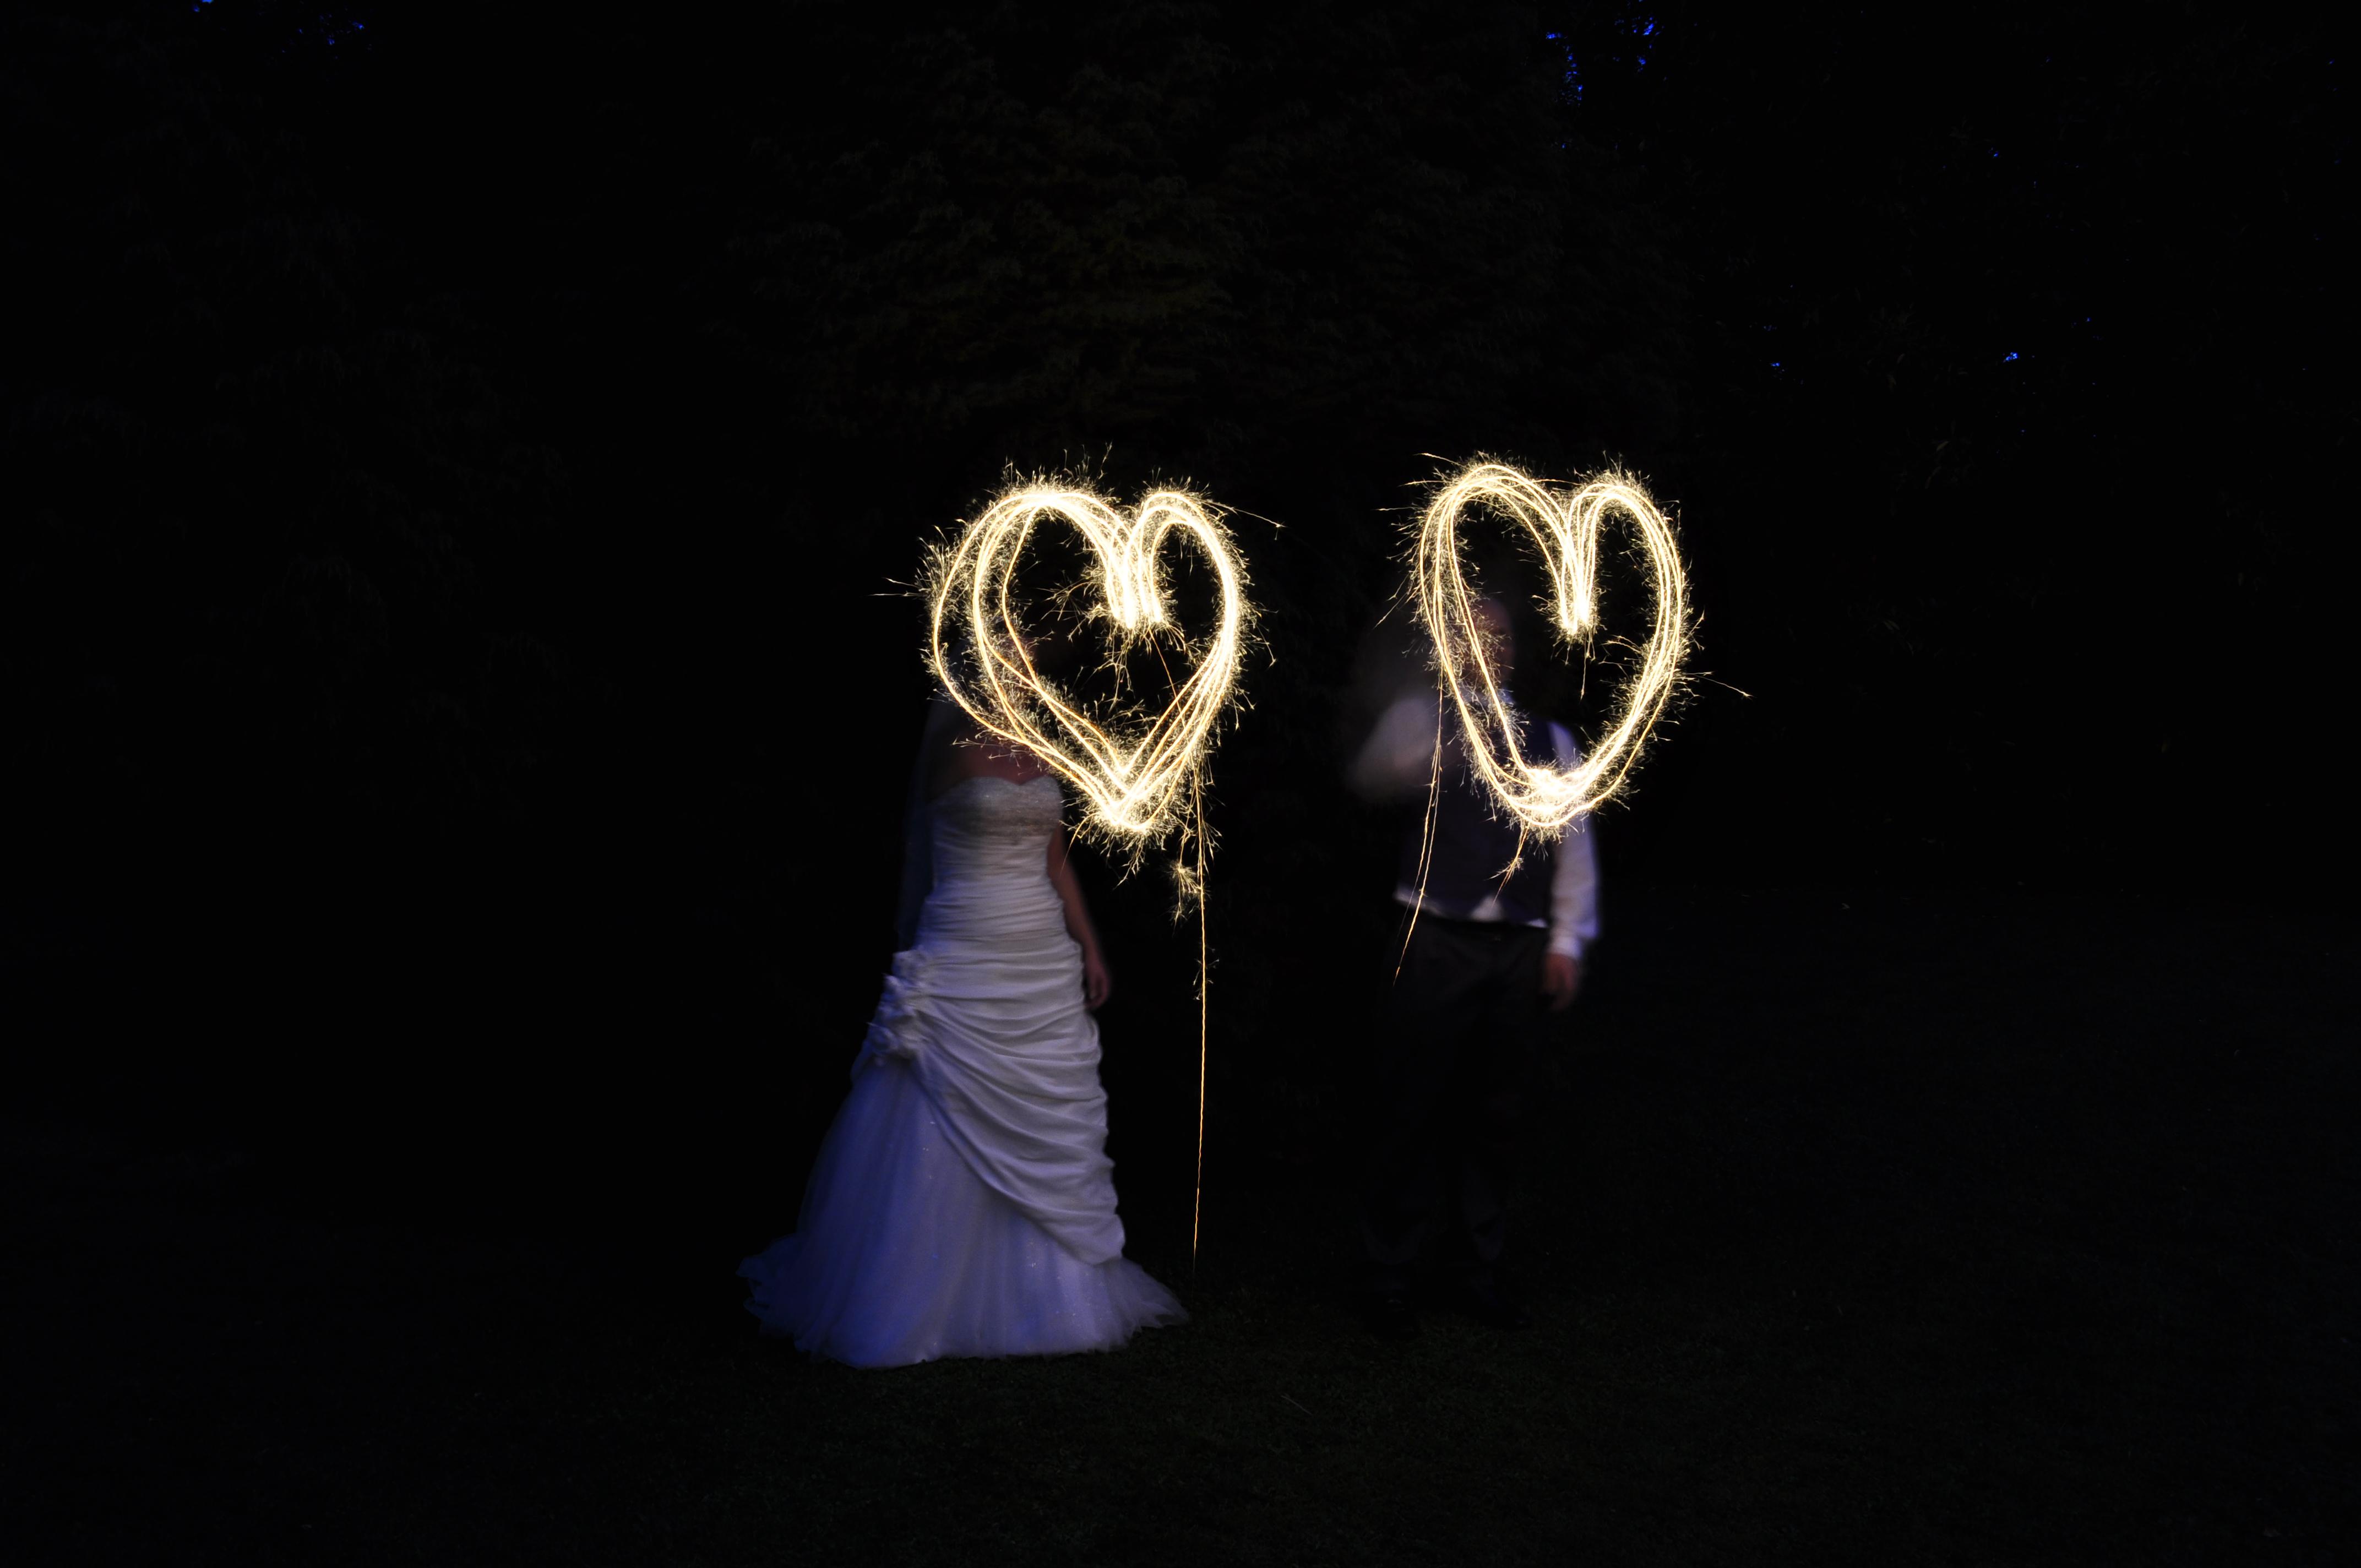 night time wedding video